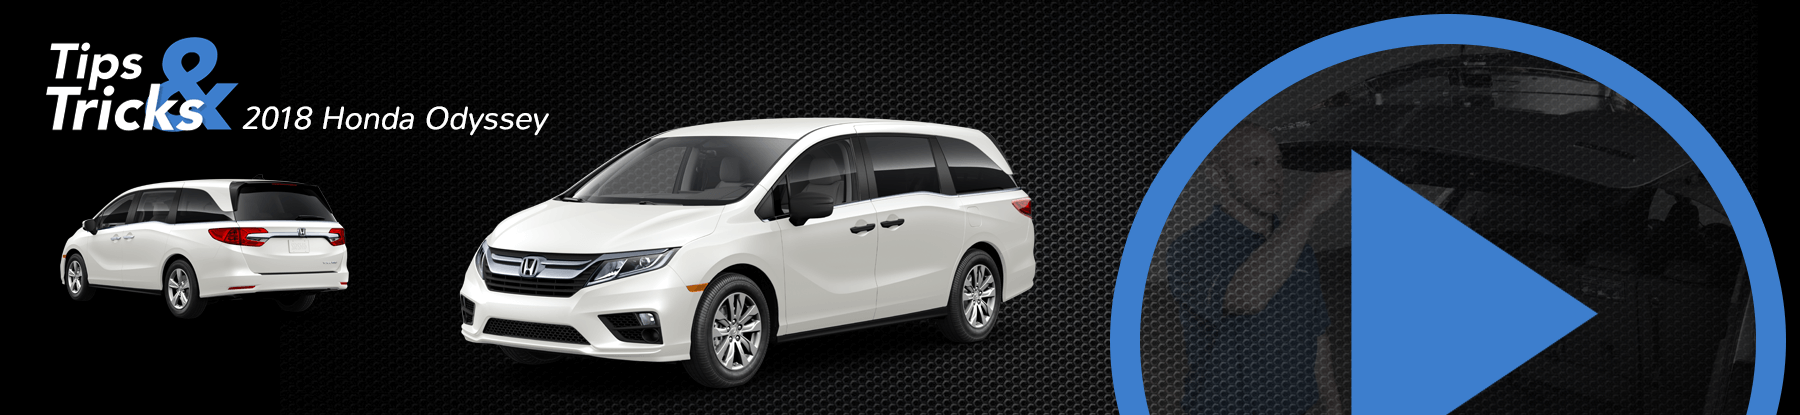 2018 Honda Odyssey Tips and Tricks